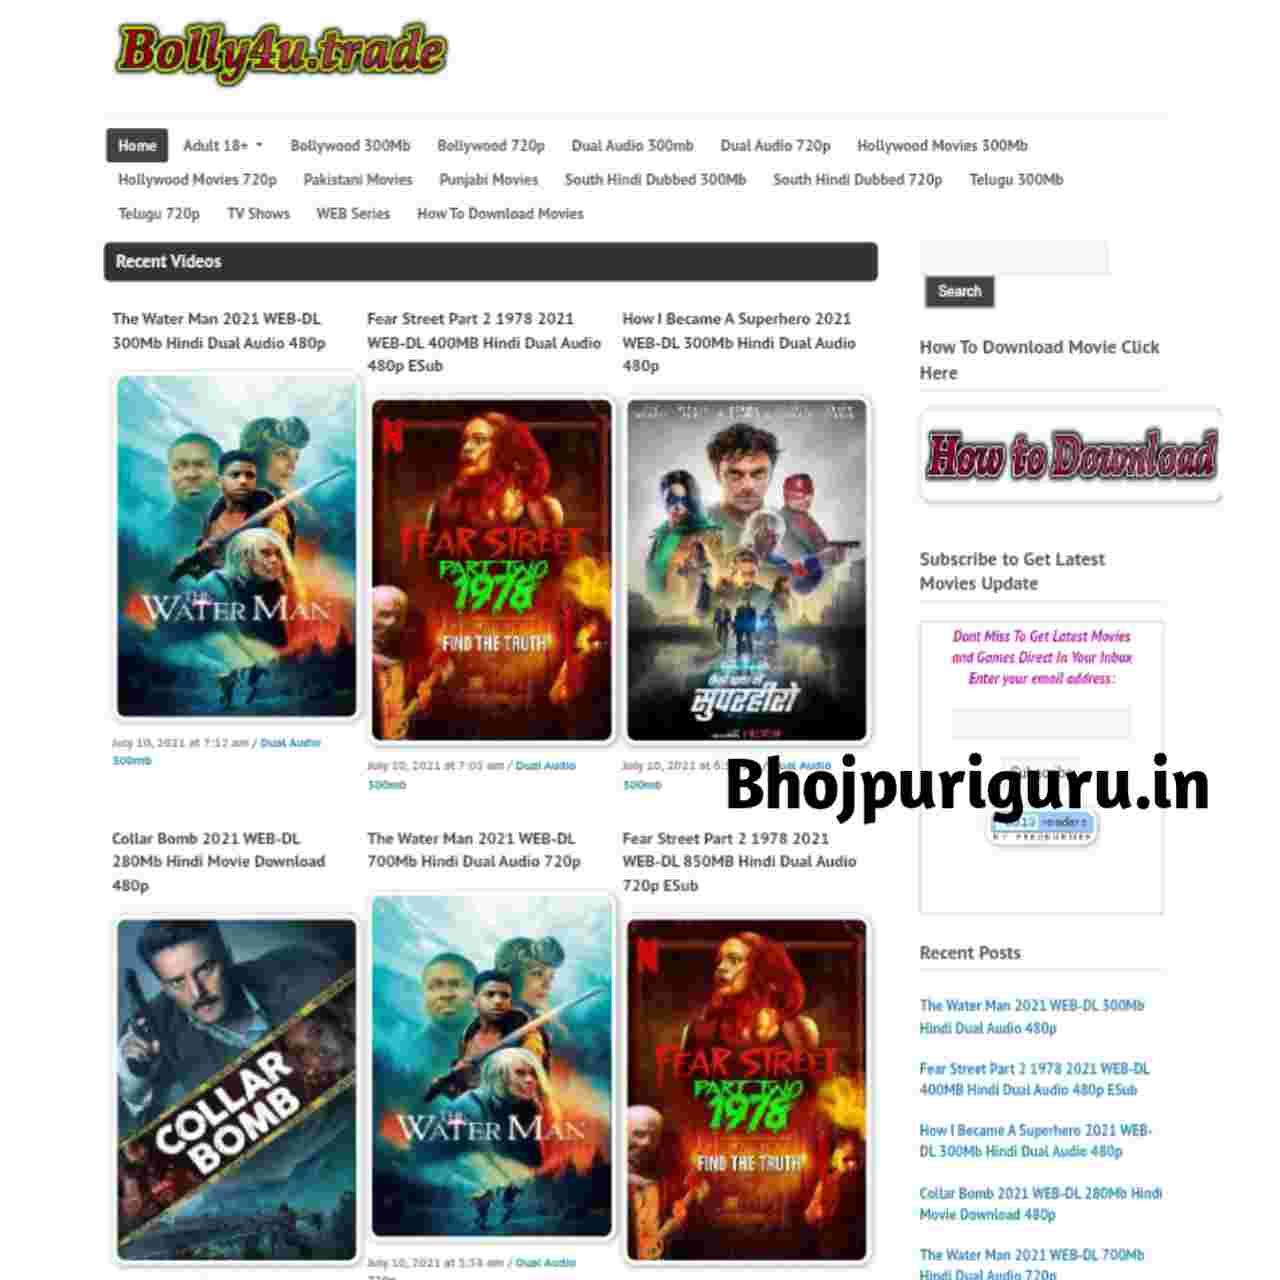 Bolly4u 2021: Bolly4u Bollywood Movies, Hollywood And South Hindi Dubbed Movies - Bhojpuri Guru